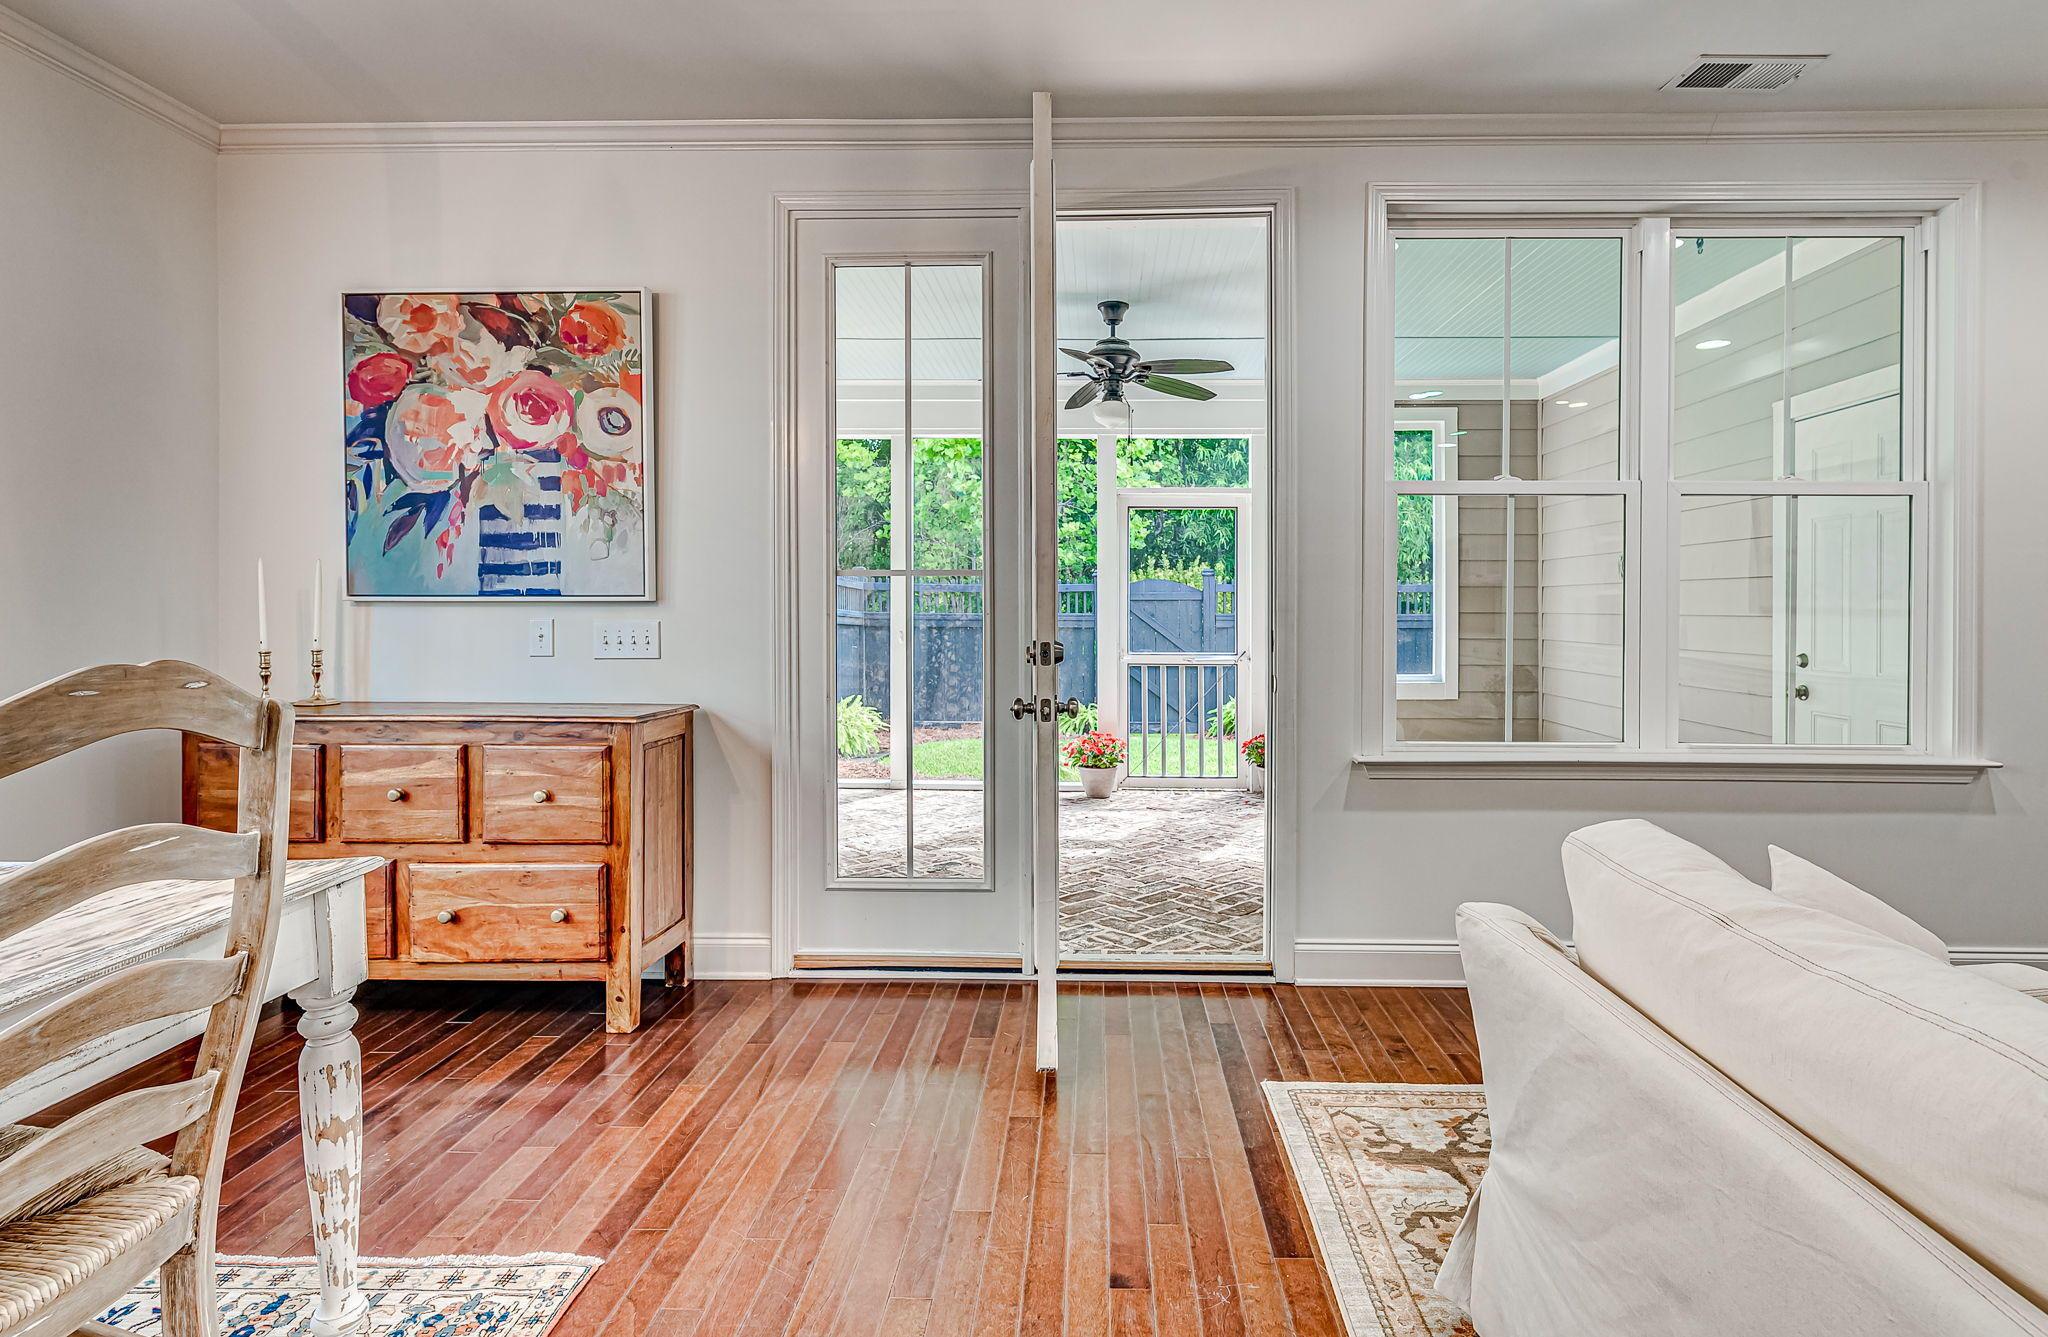 Dunes West Homes For Sale - 2476 Kings Gate, Mount Pleasant, SC - 1